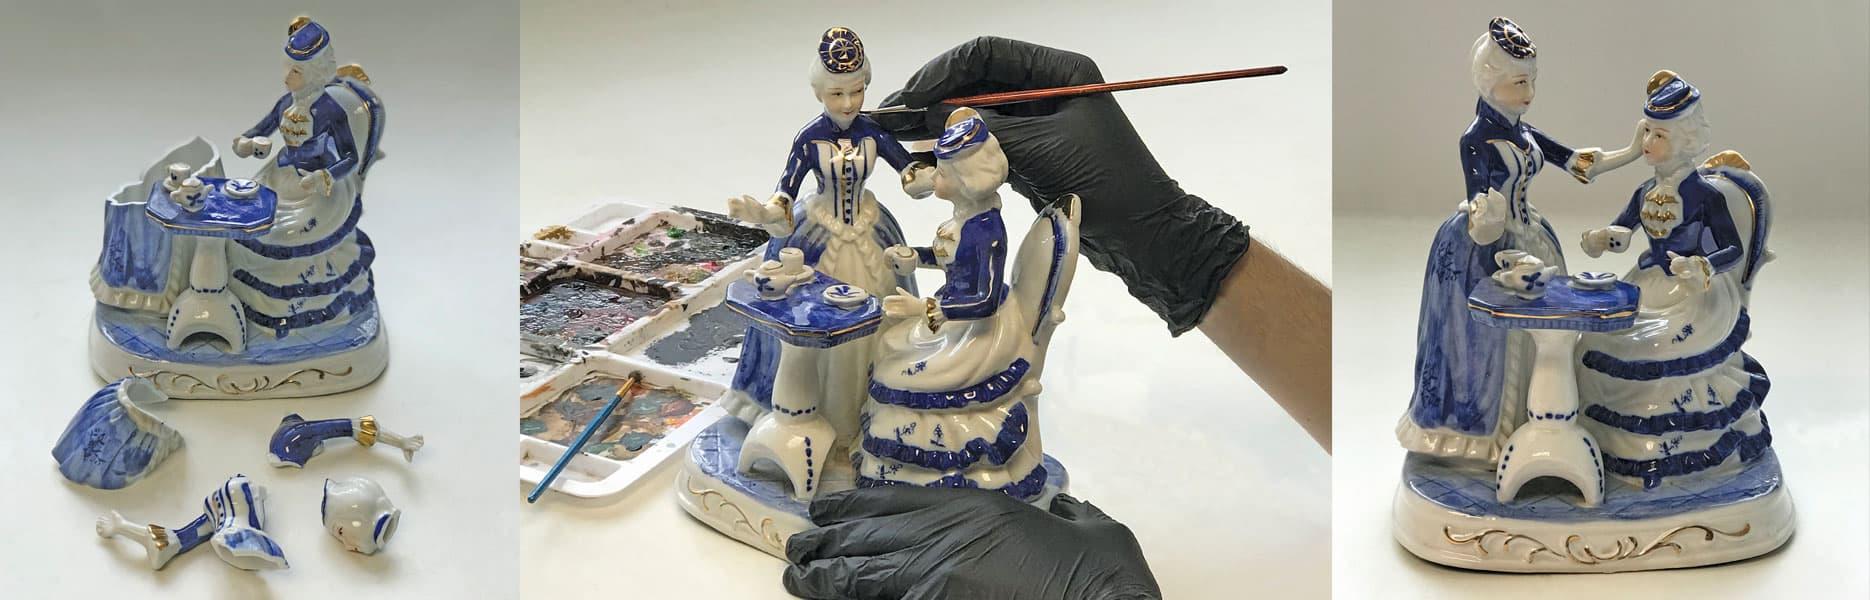 Figurine Repair - Before & After